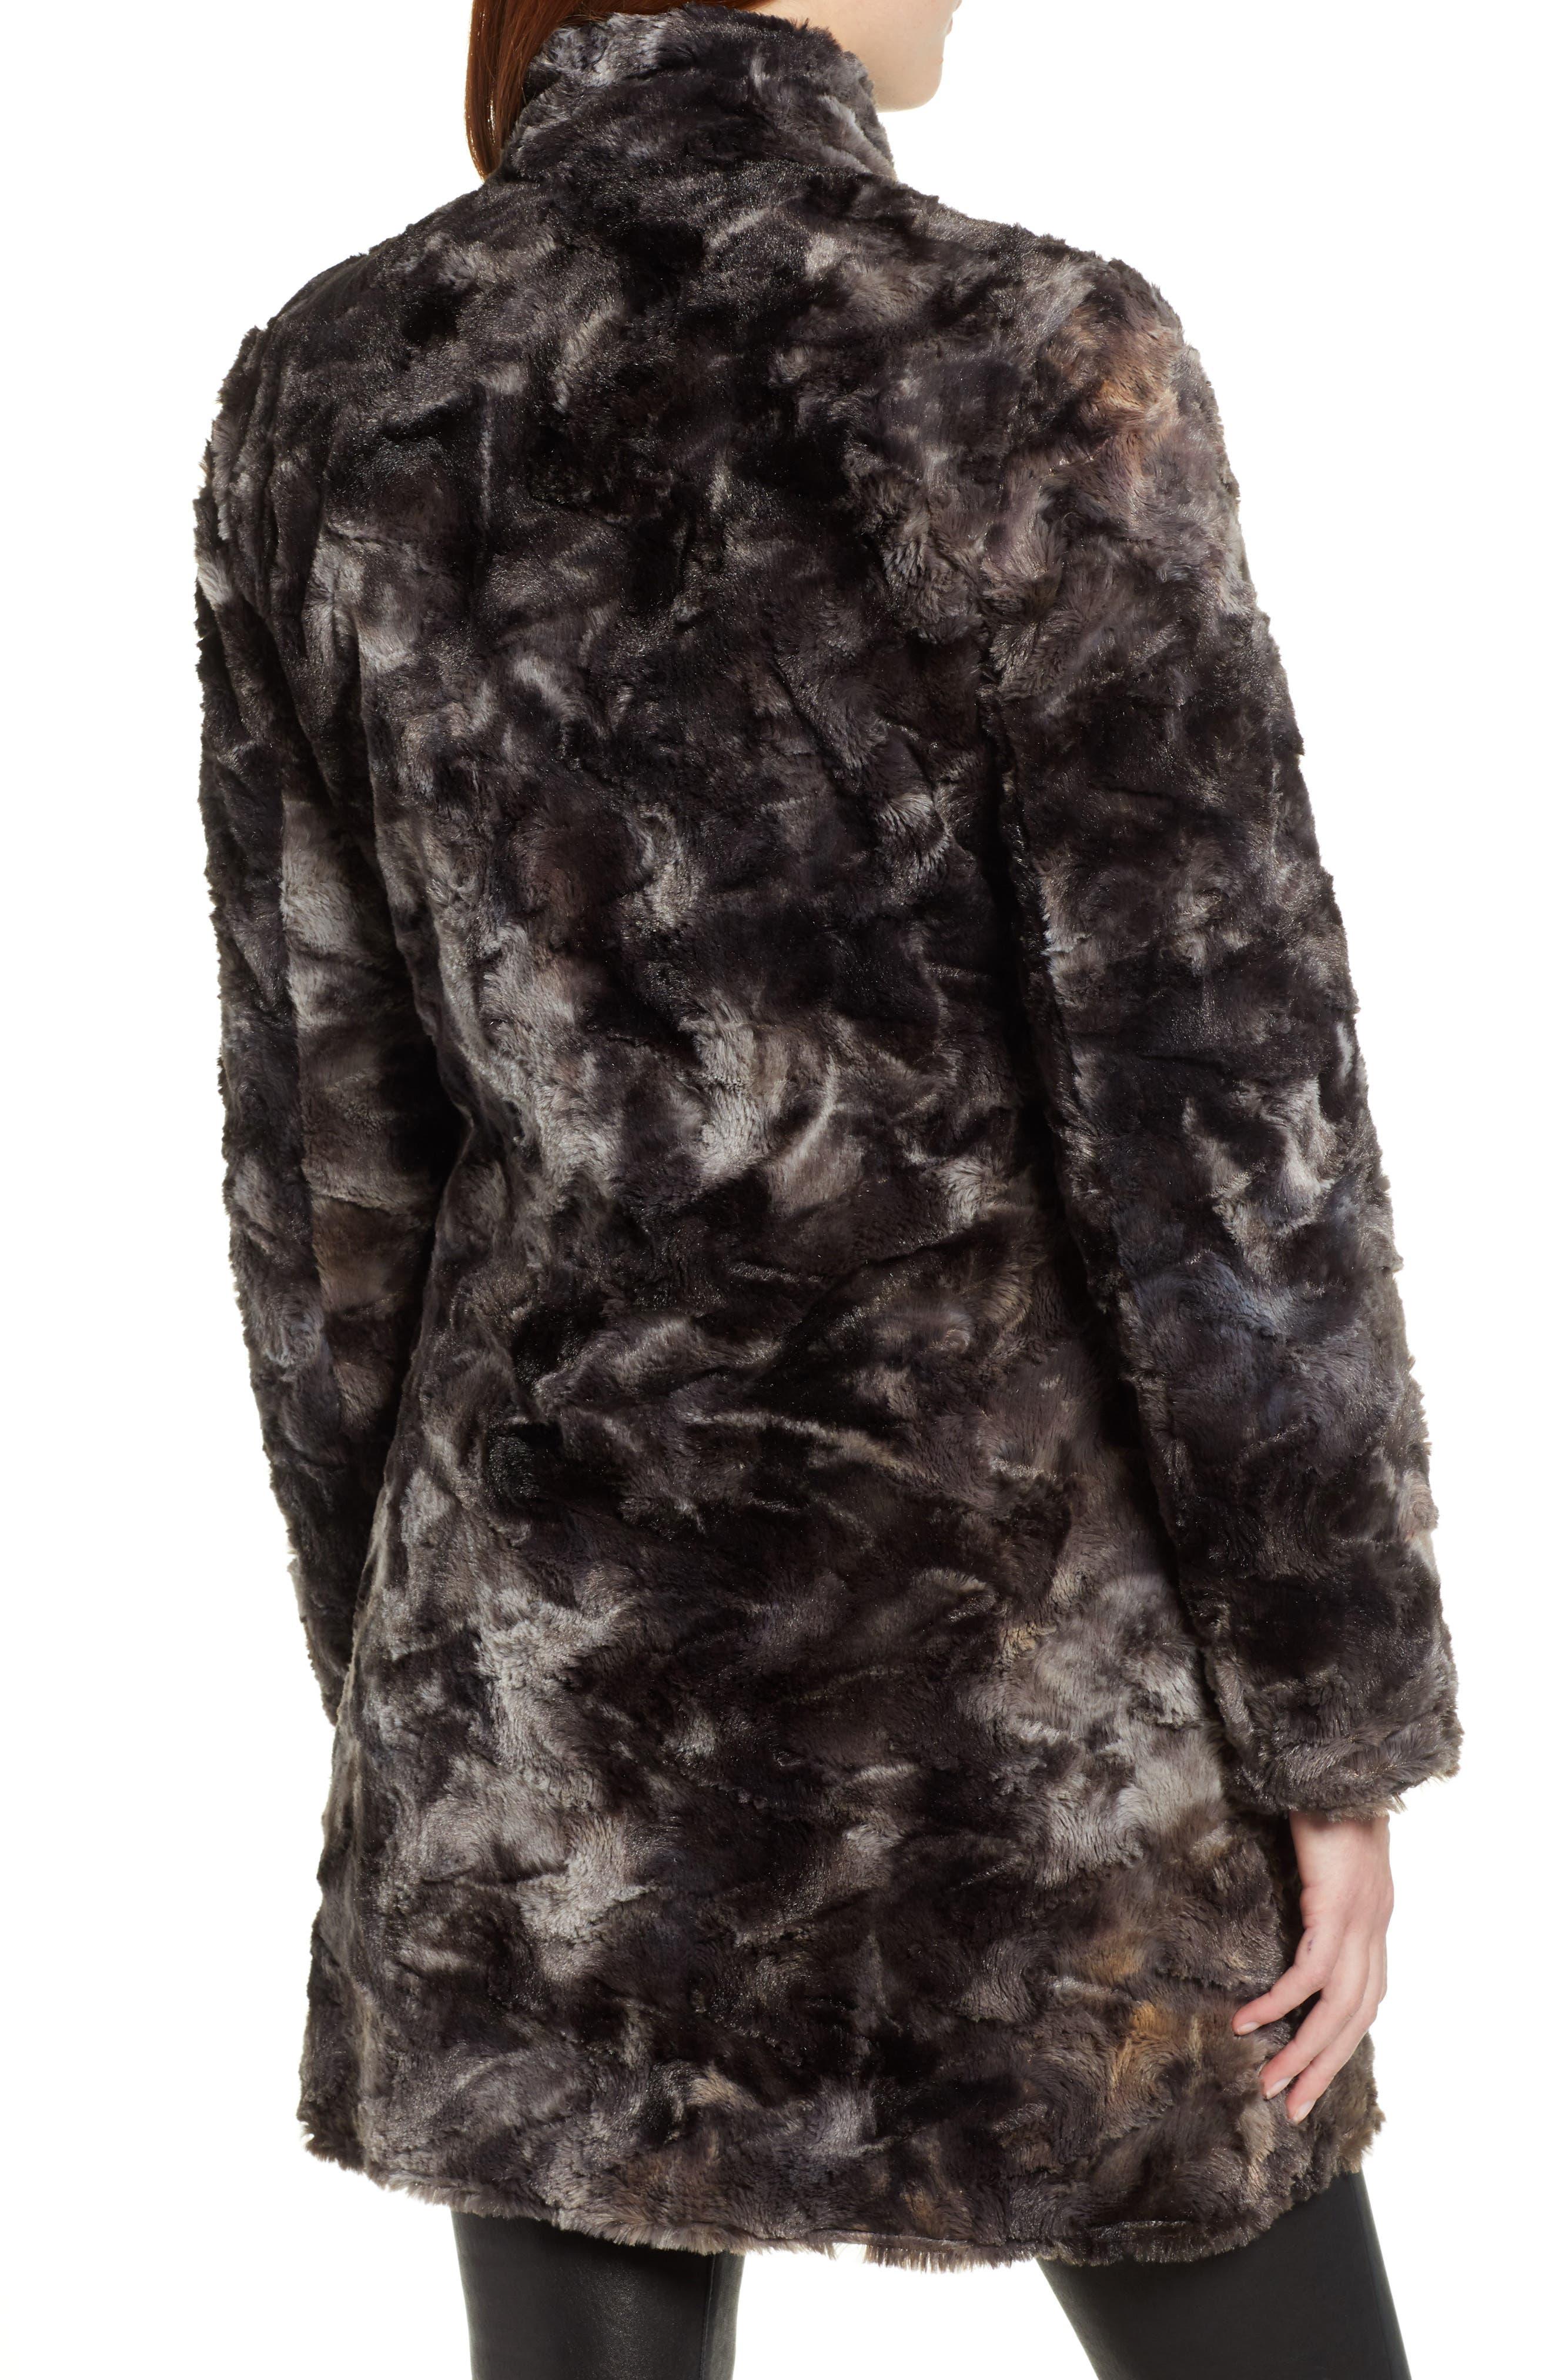 Reversible Faux Leopard Fur Coat,                             Alternate thumbnail 3, color,                             MARLED